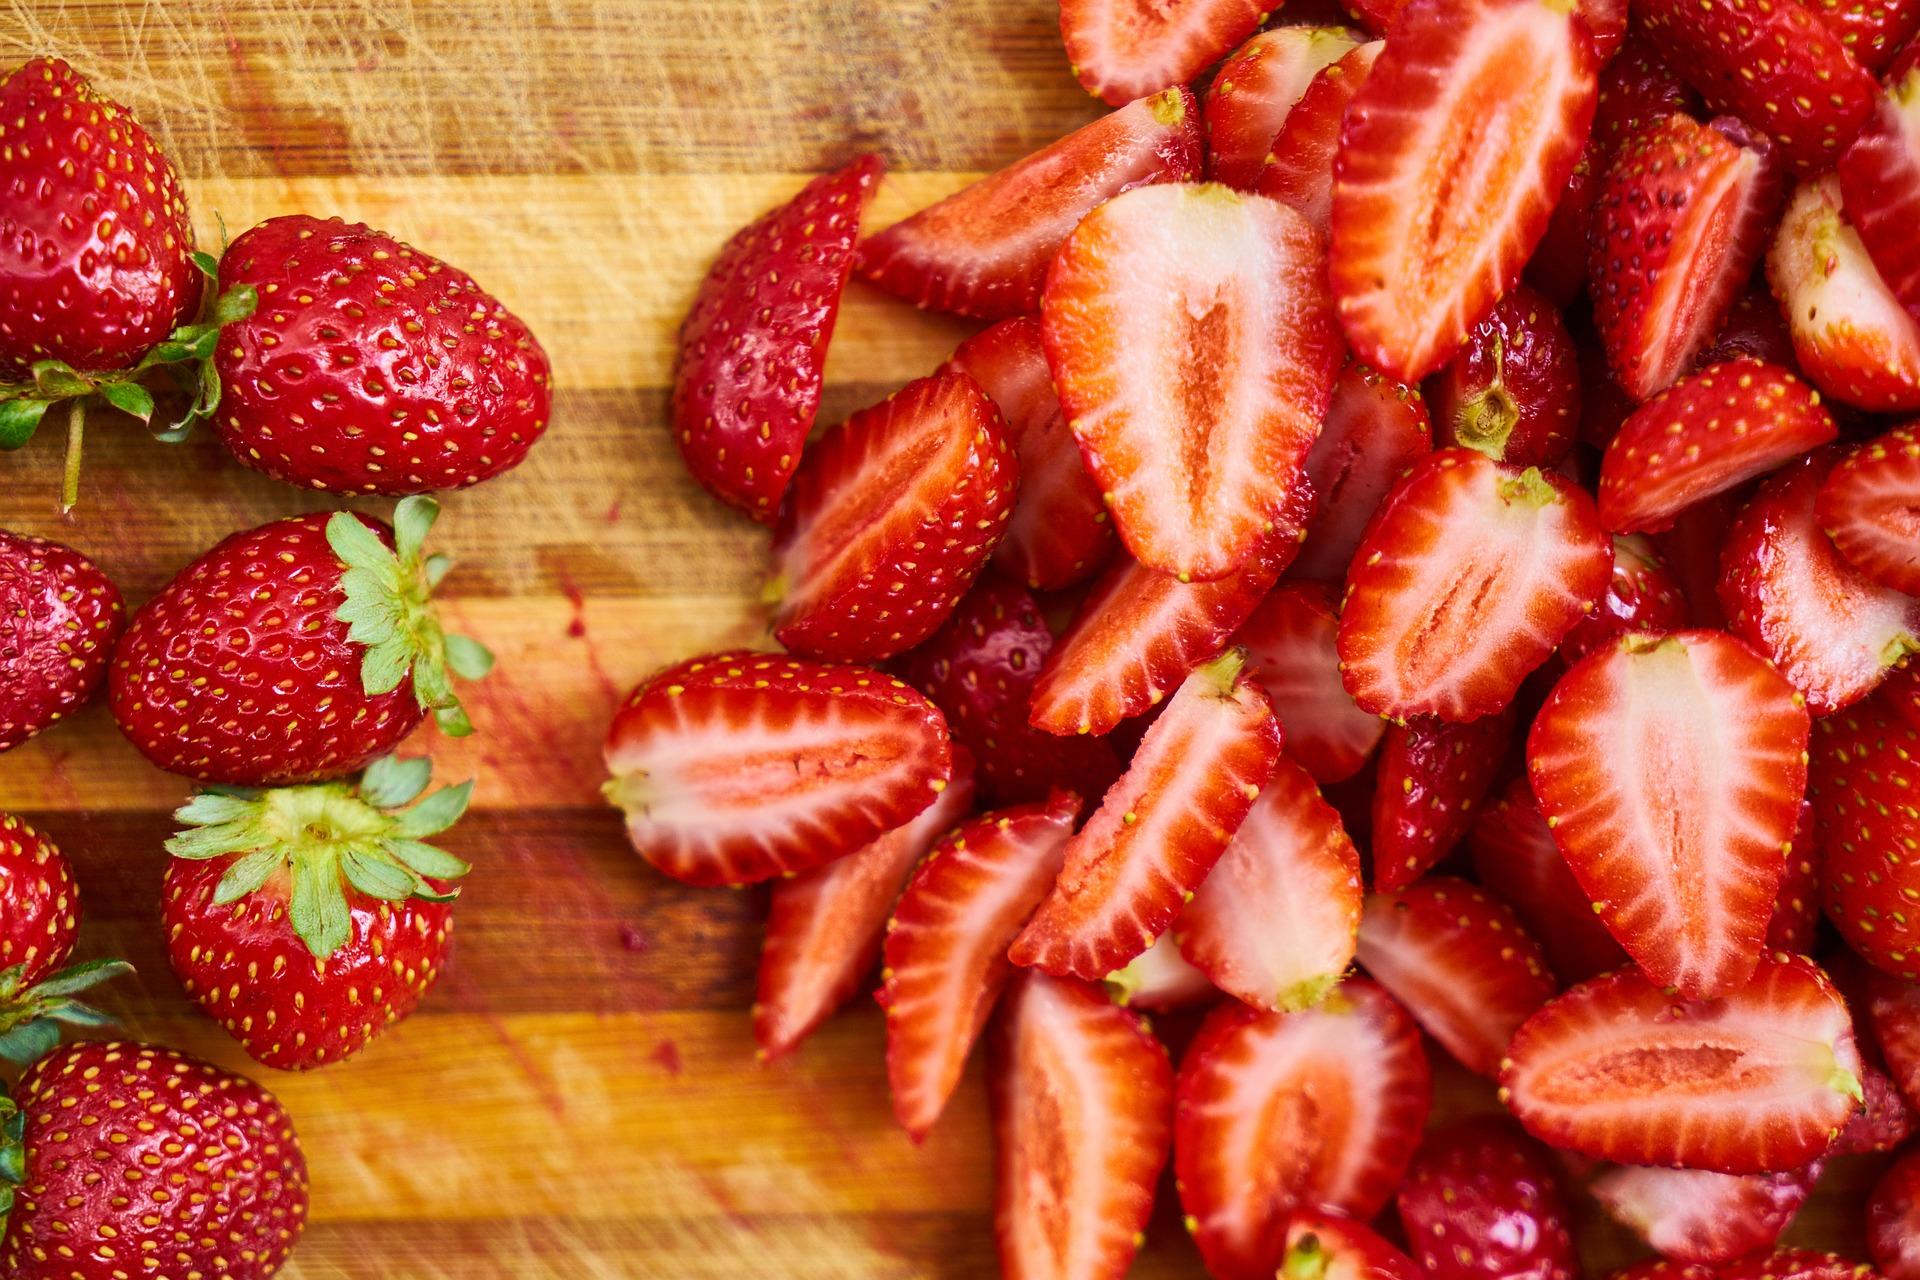 strawberry-2960533_1920.jpg